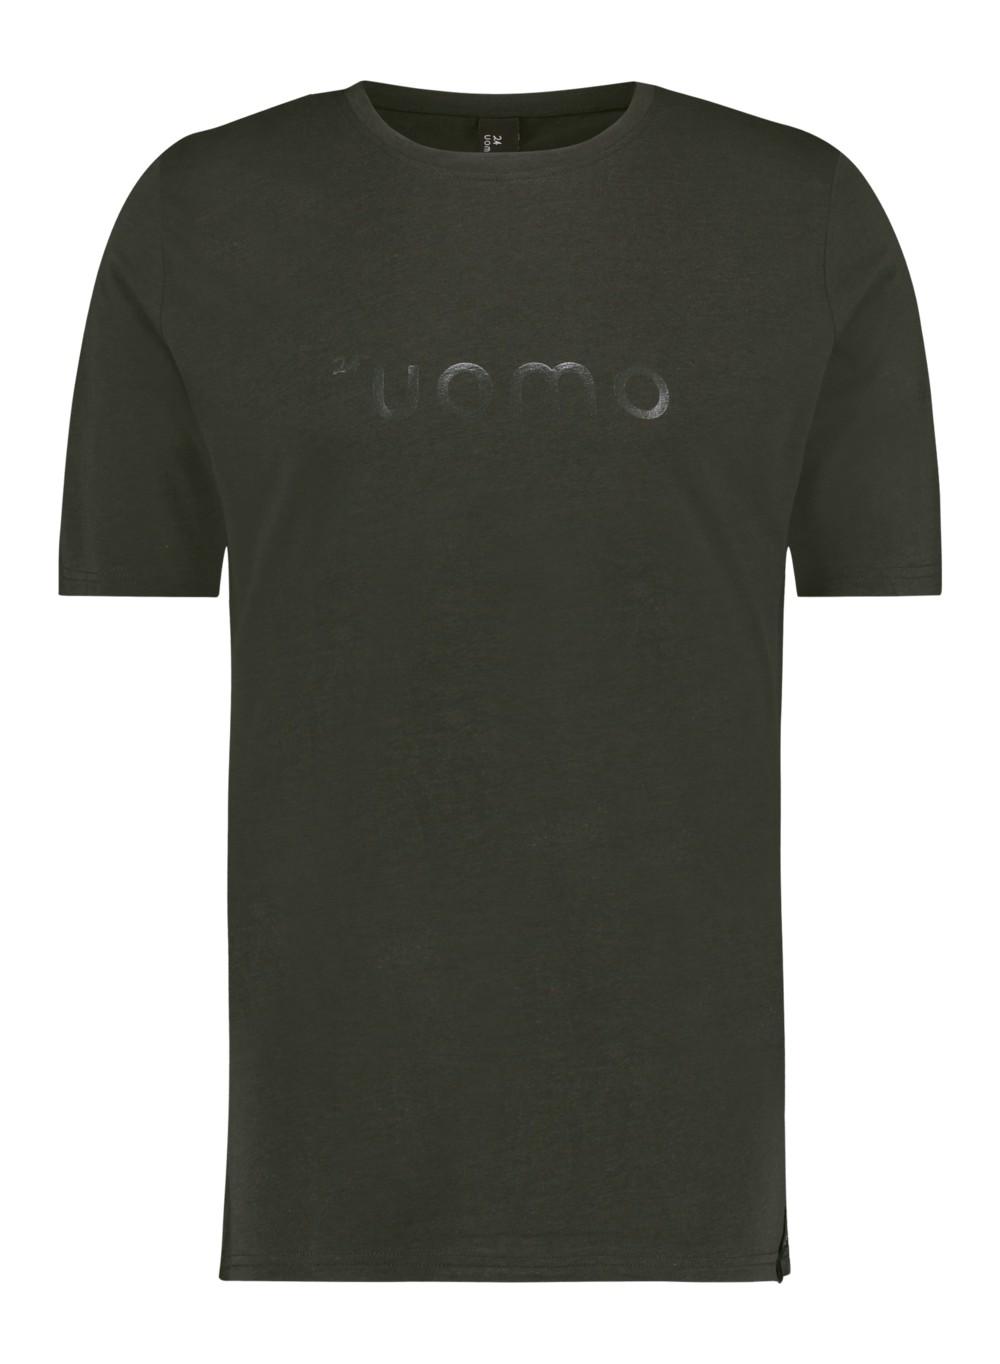 Afbeelding van 24UOMO 24 uomo my6 t-shirt – donker groen army